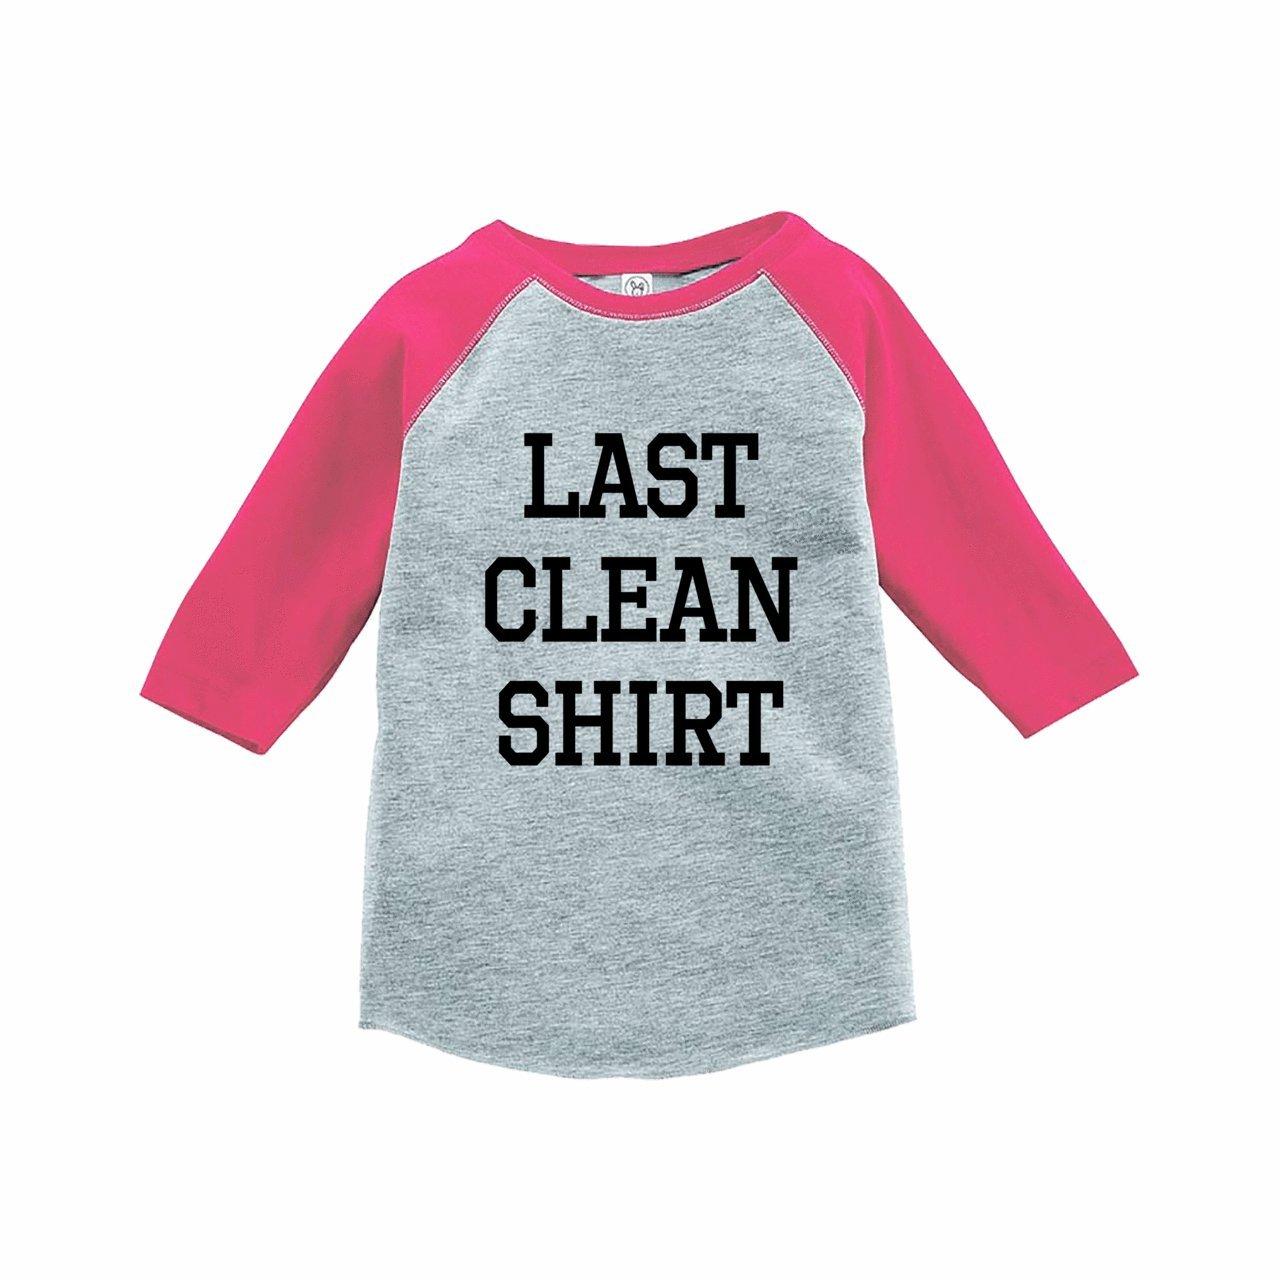 7 ate 9 Apparel Funny Kids Last Clean Shirt Baseball Tee Pink